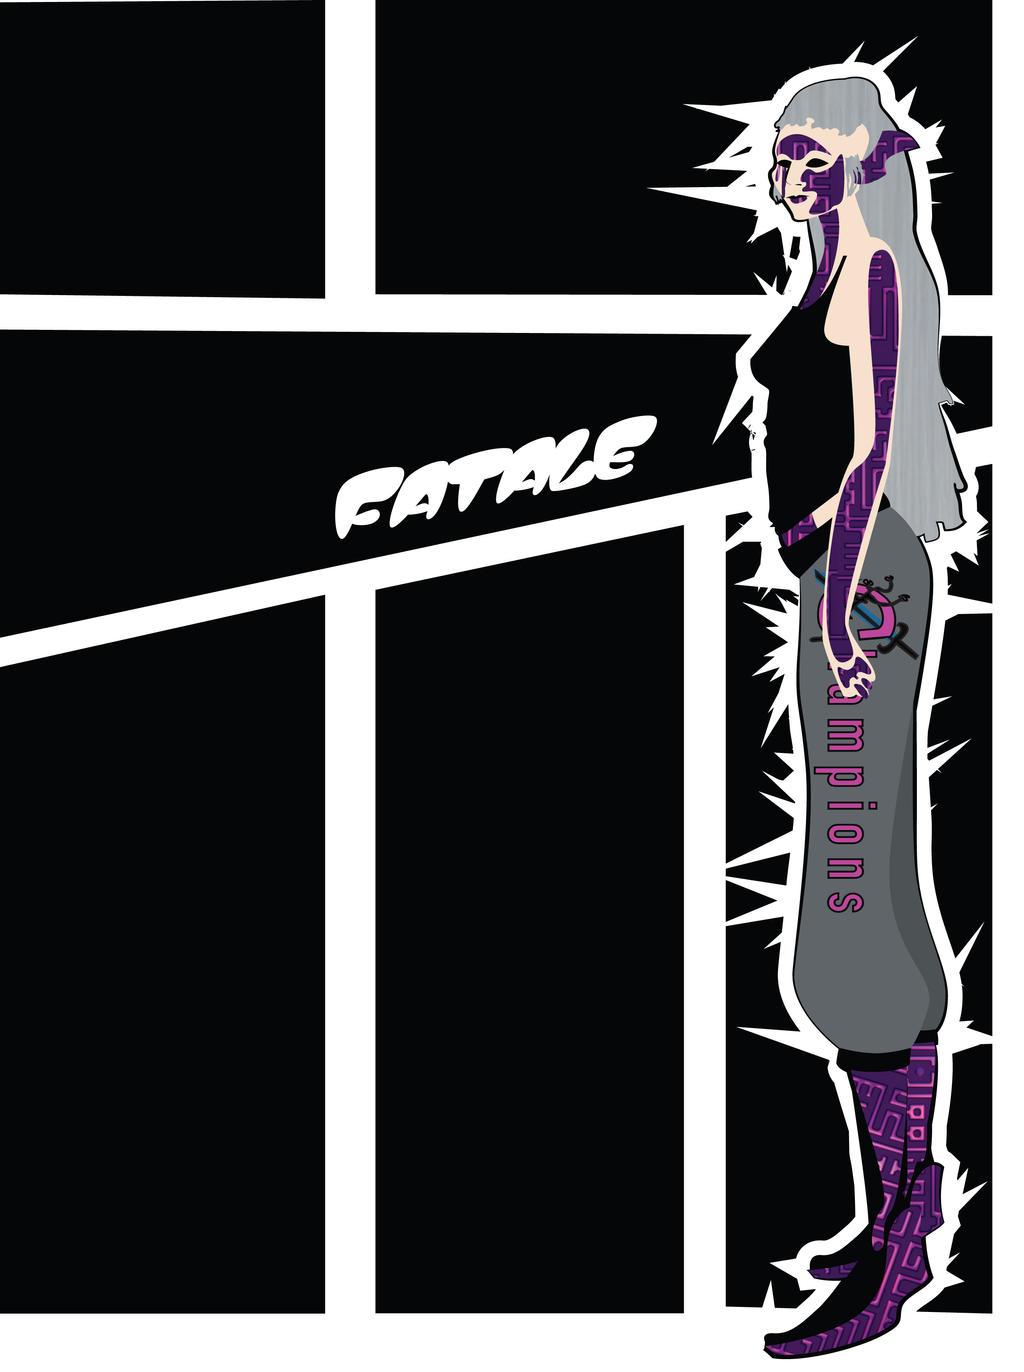 Costume Design: Soon I Will Be Invincible: Fatale by phantomonex